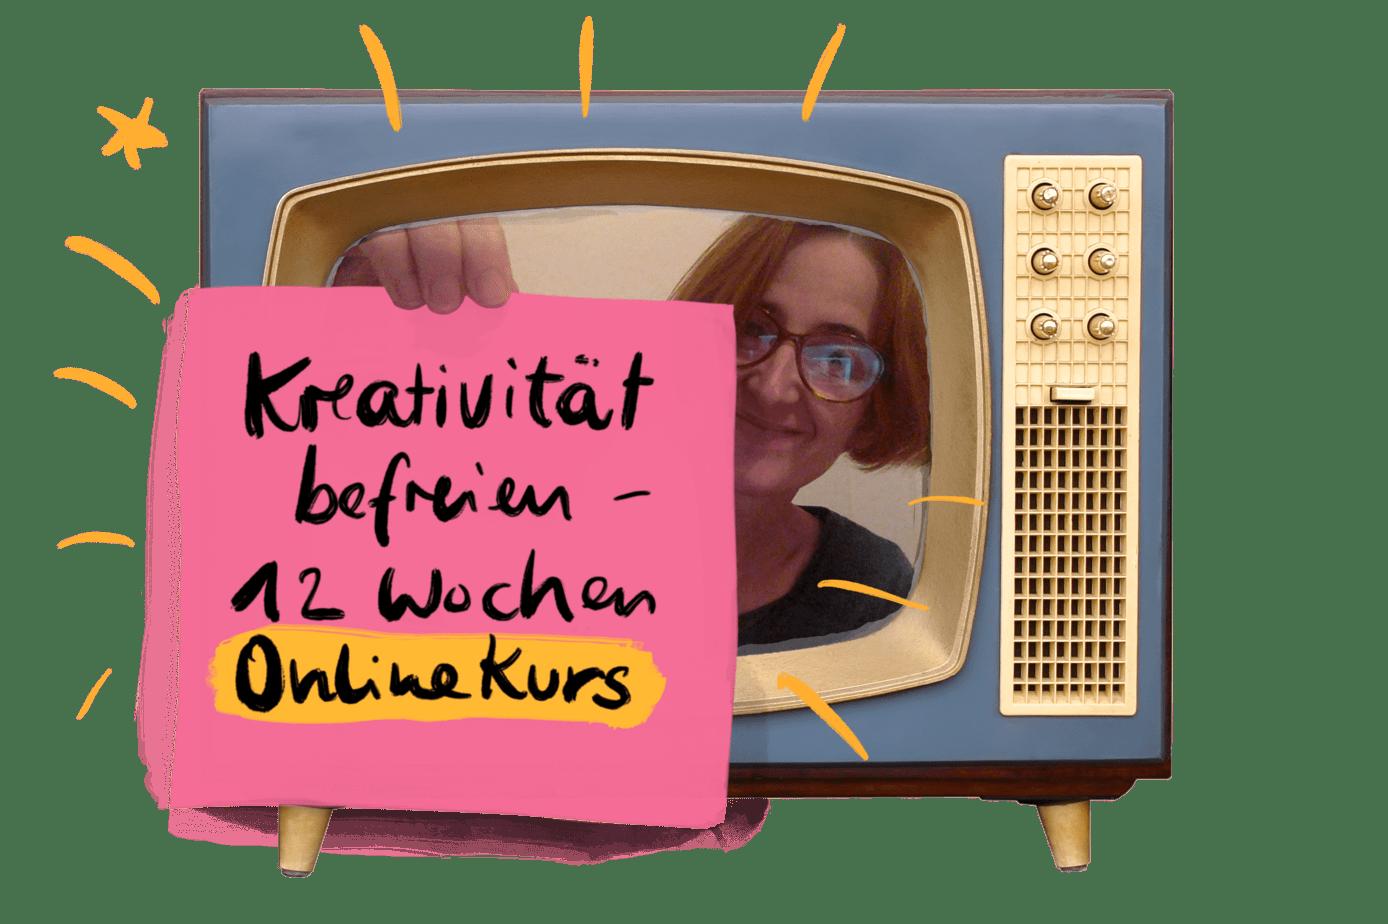 Online-Kurs Kreative Befreiung